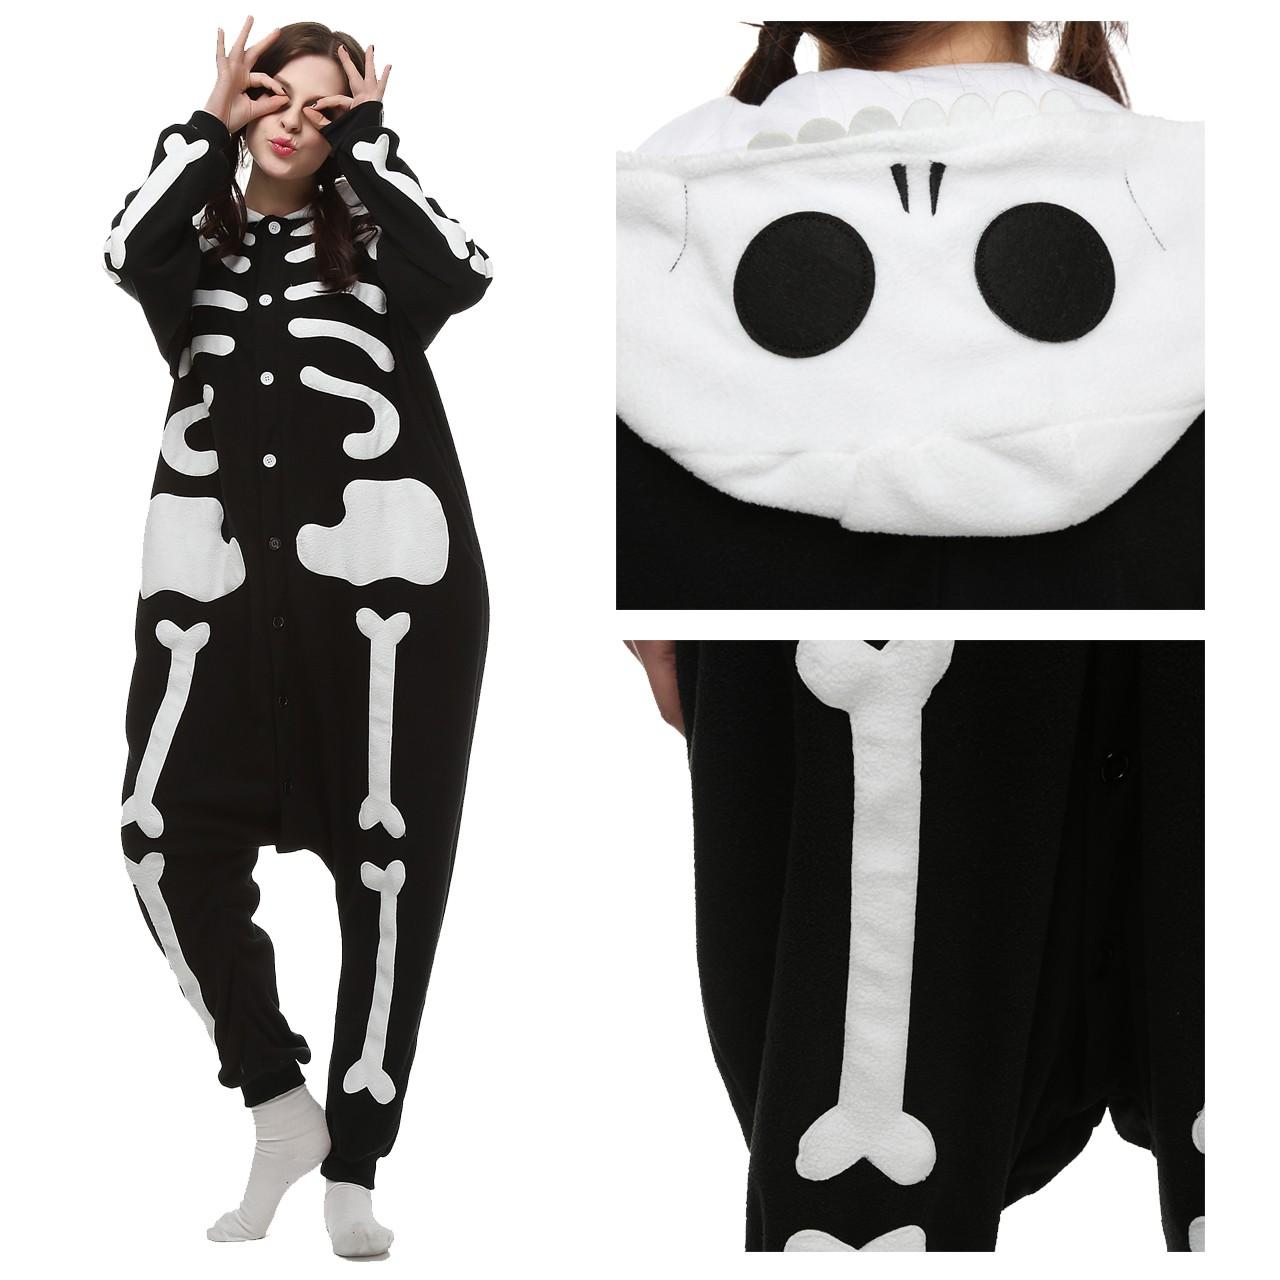 02736bea504 Skeleton Onesie Unisex Women   Men Kigurumi Pajama Carnival Costumes